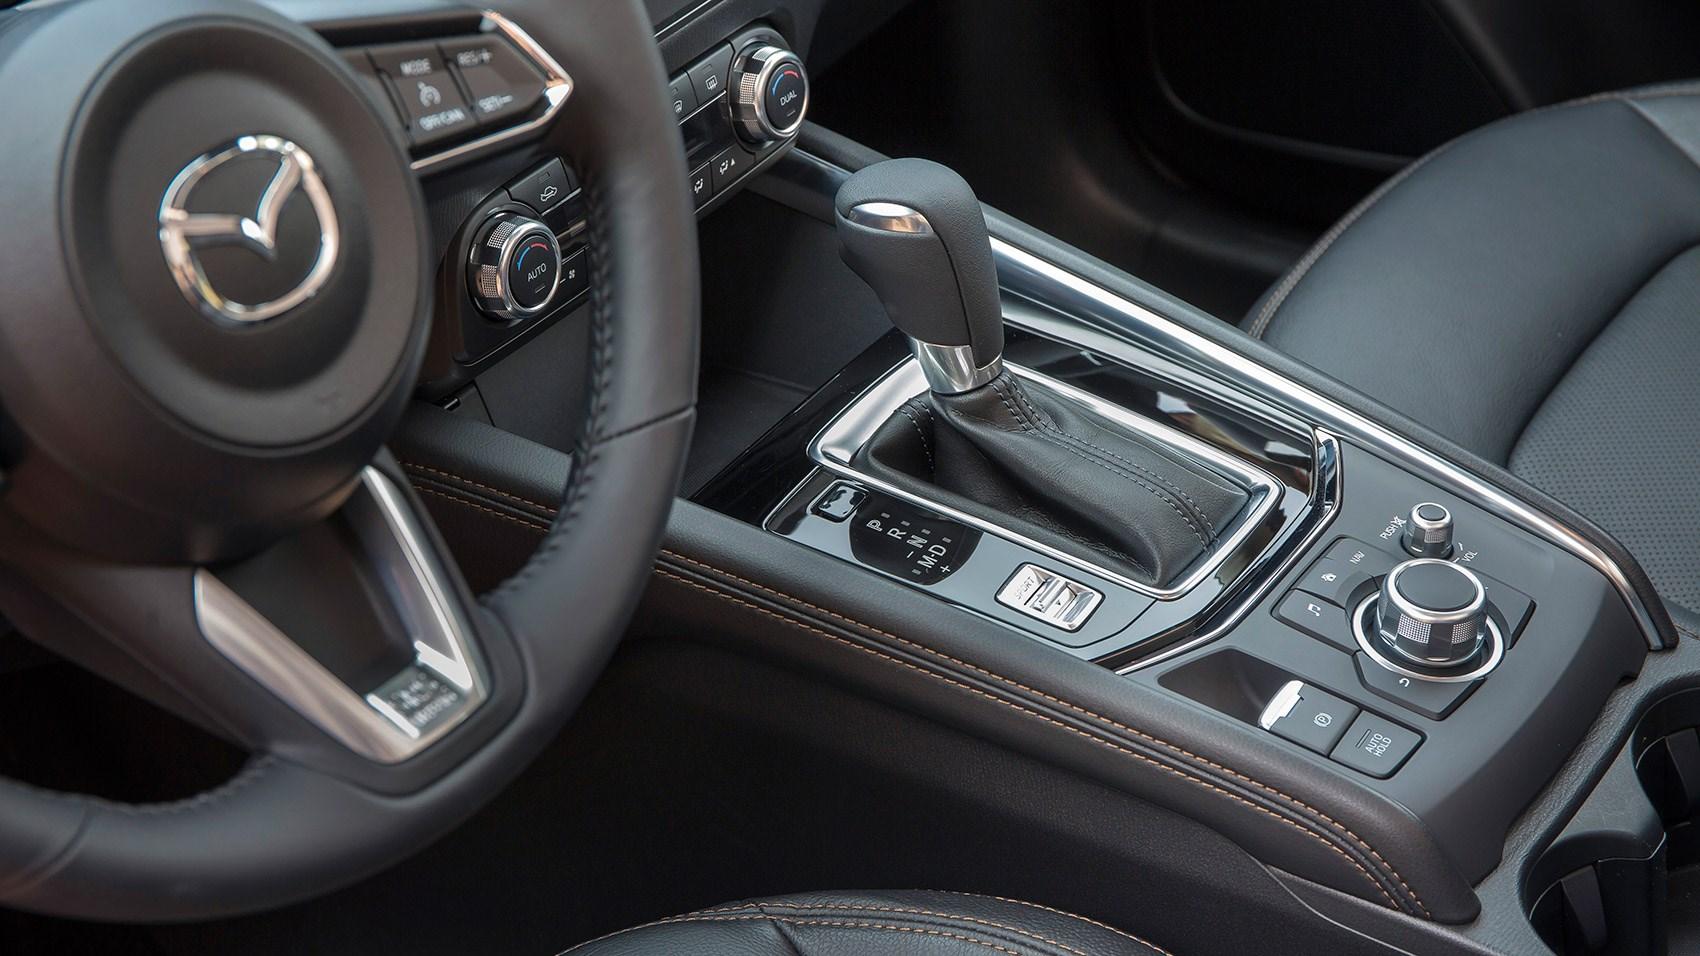 mazda cx 5 manual gearbox